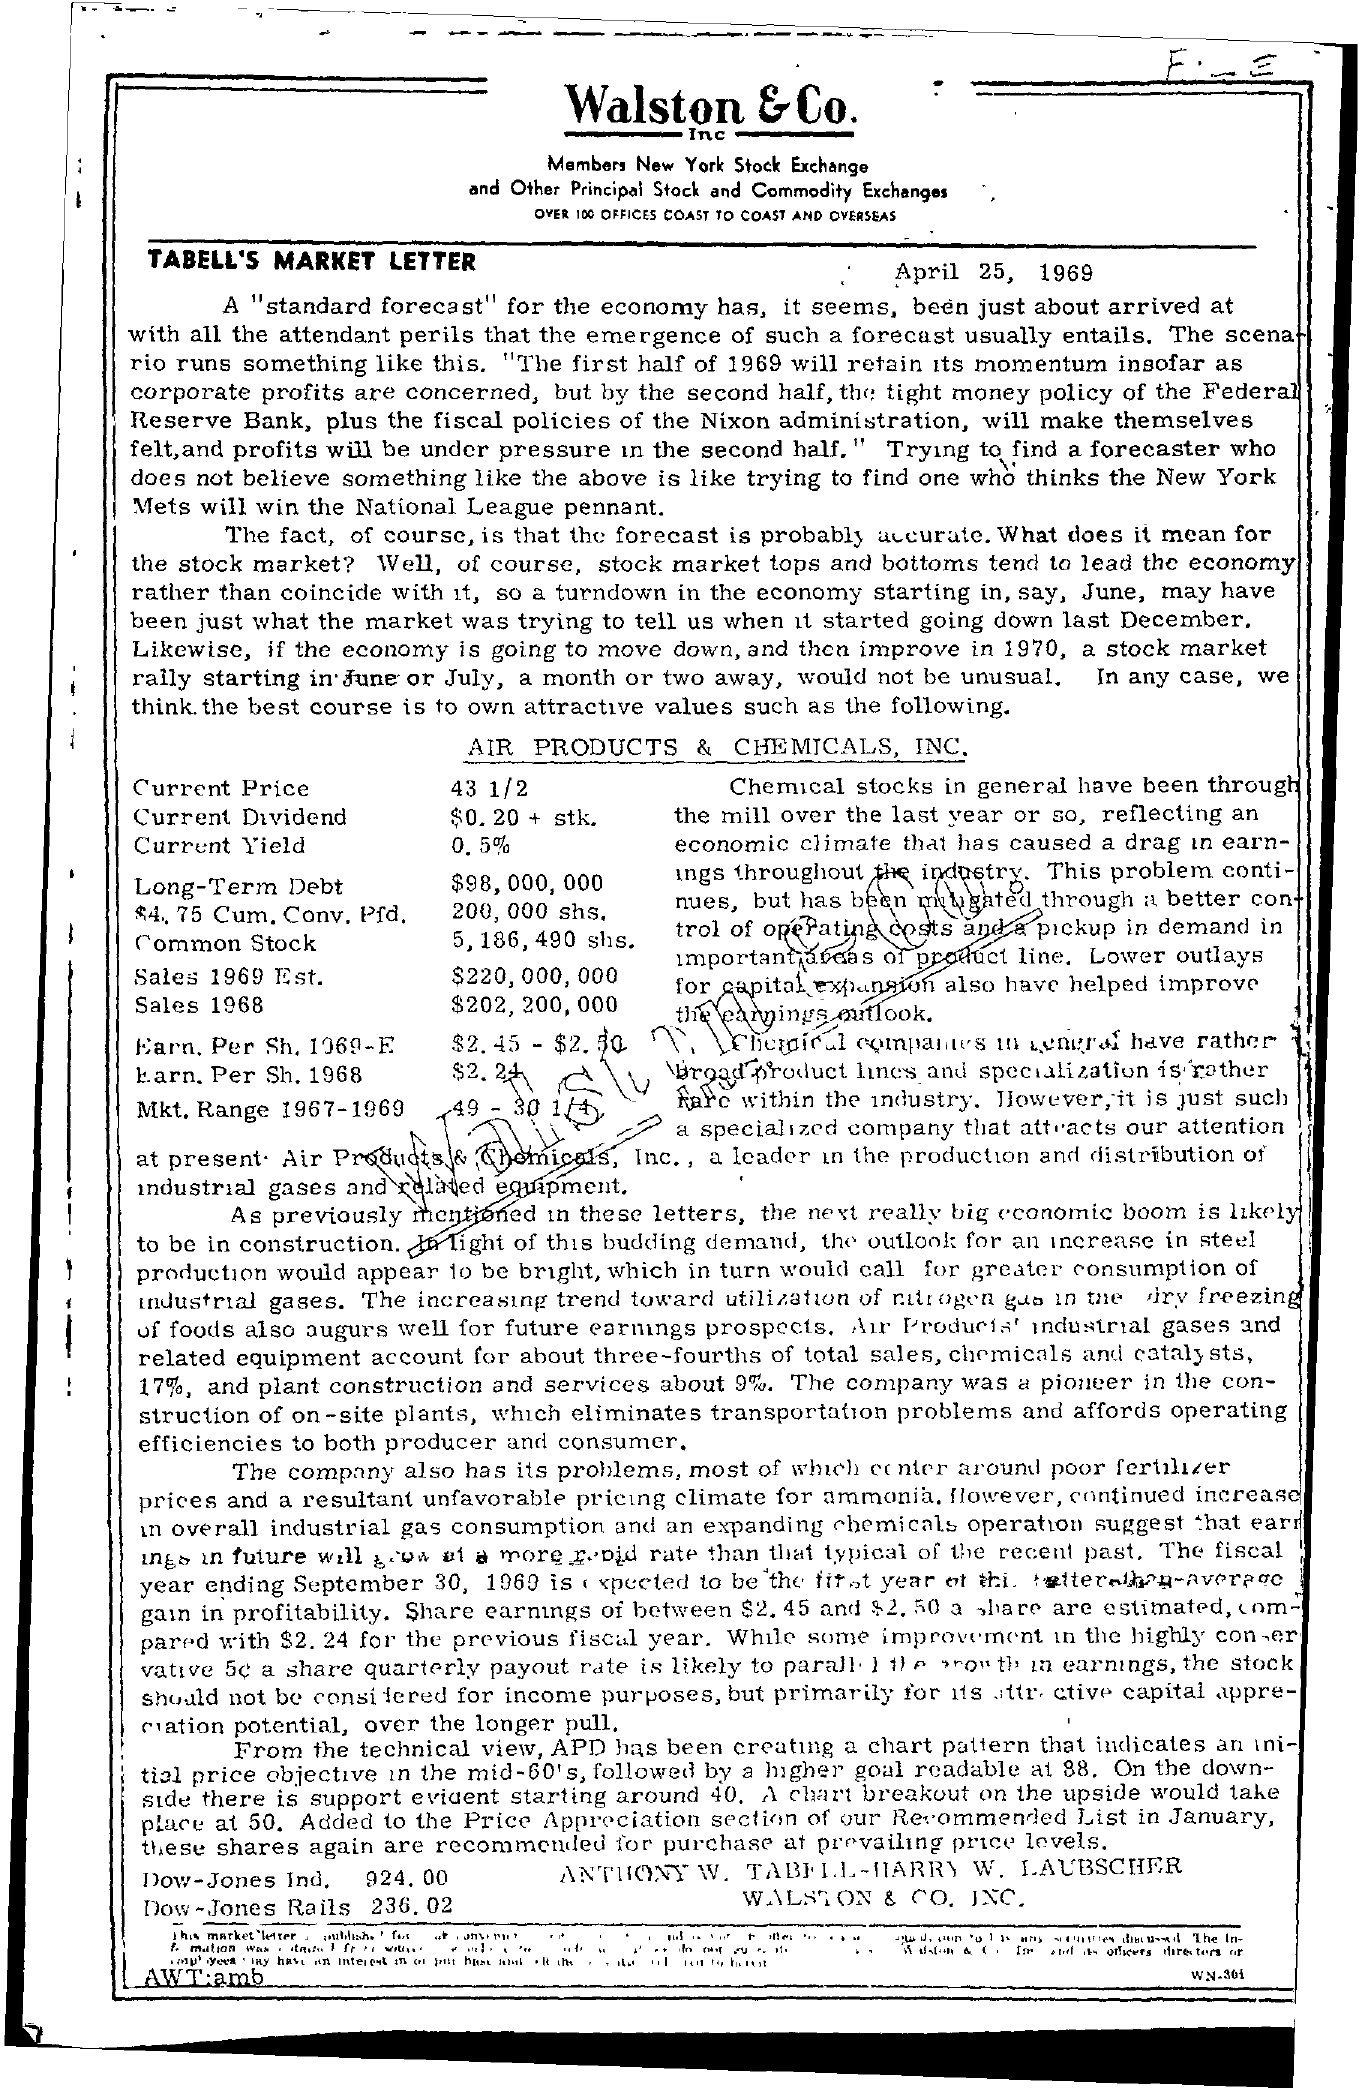 Tabell's Market Letter - April 25, 1969